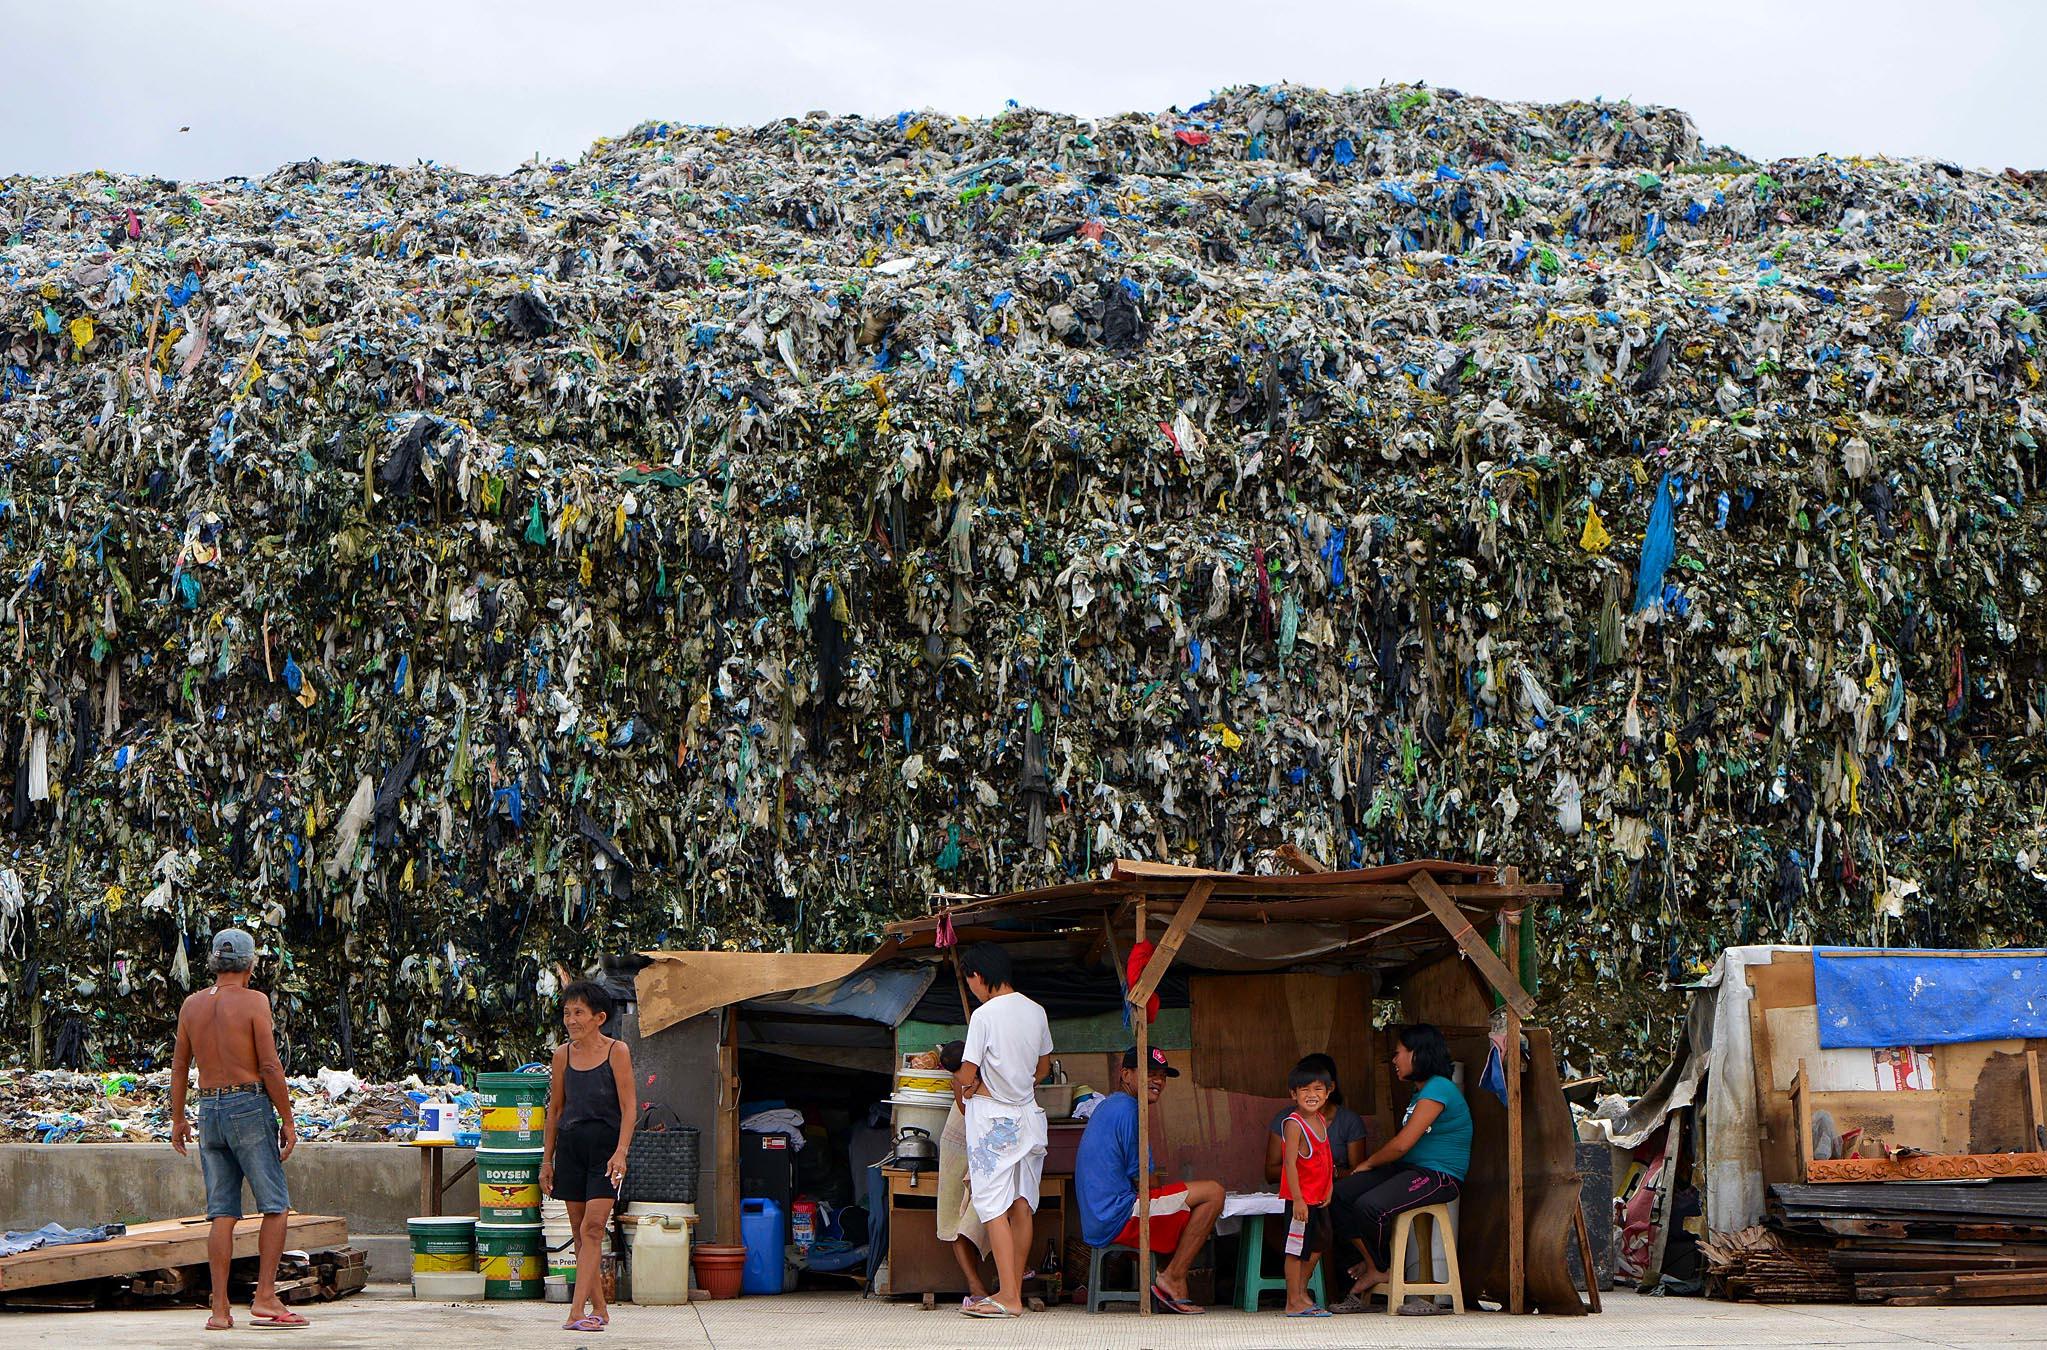 Garbage dump in Manila